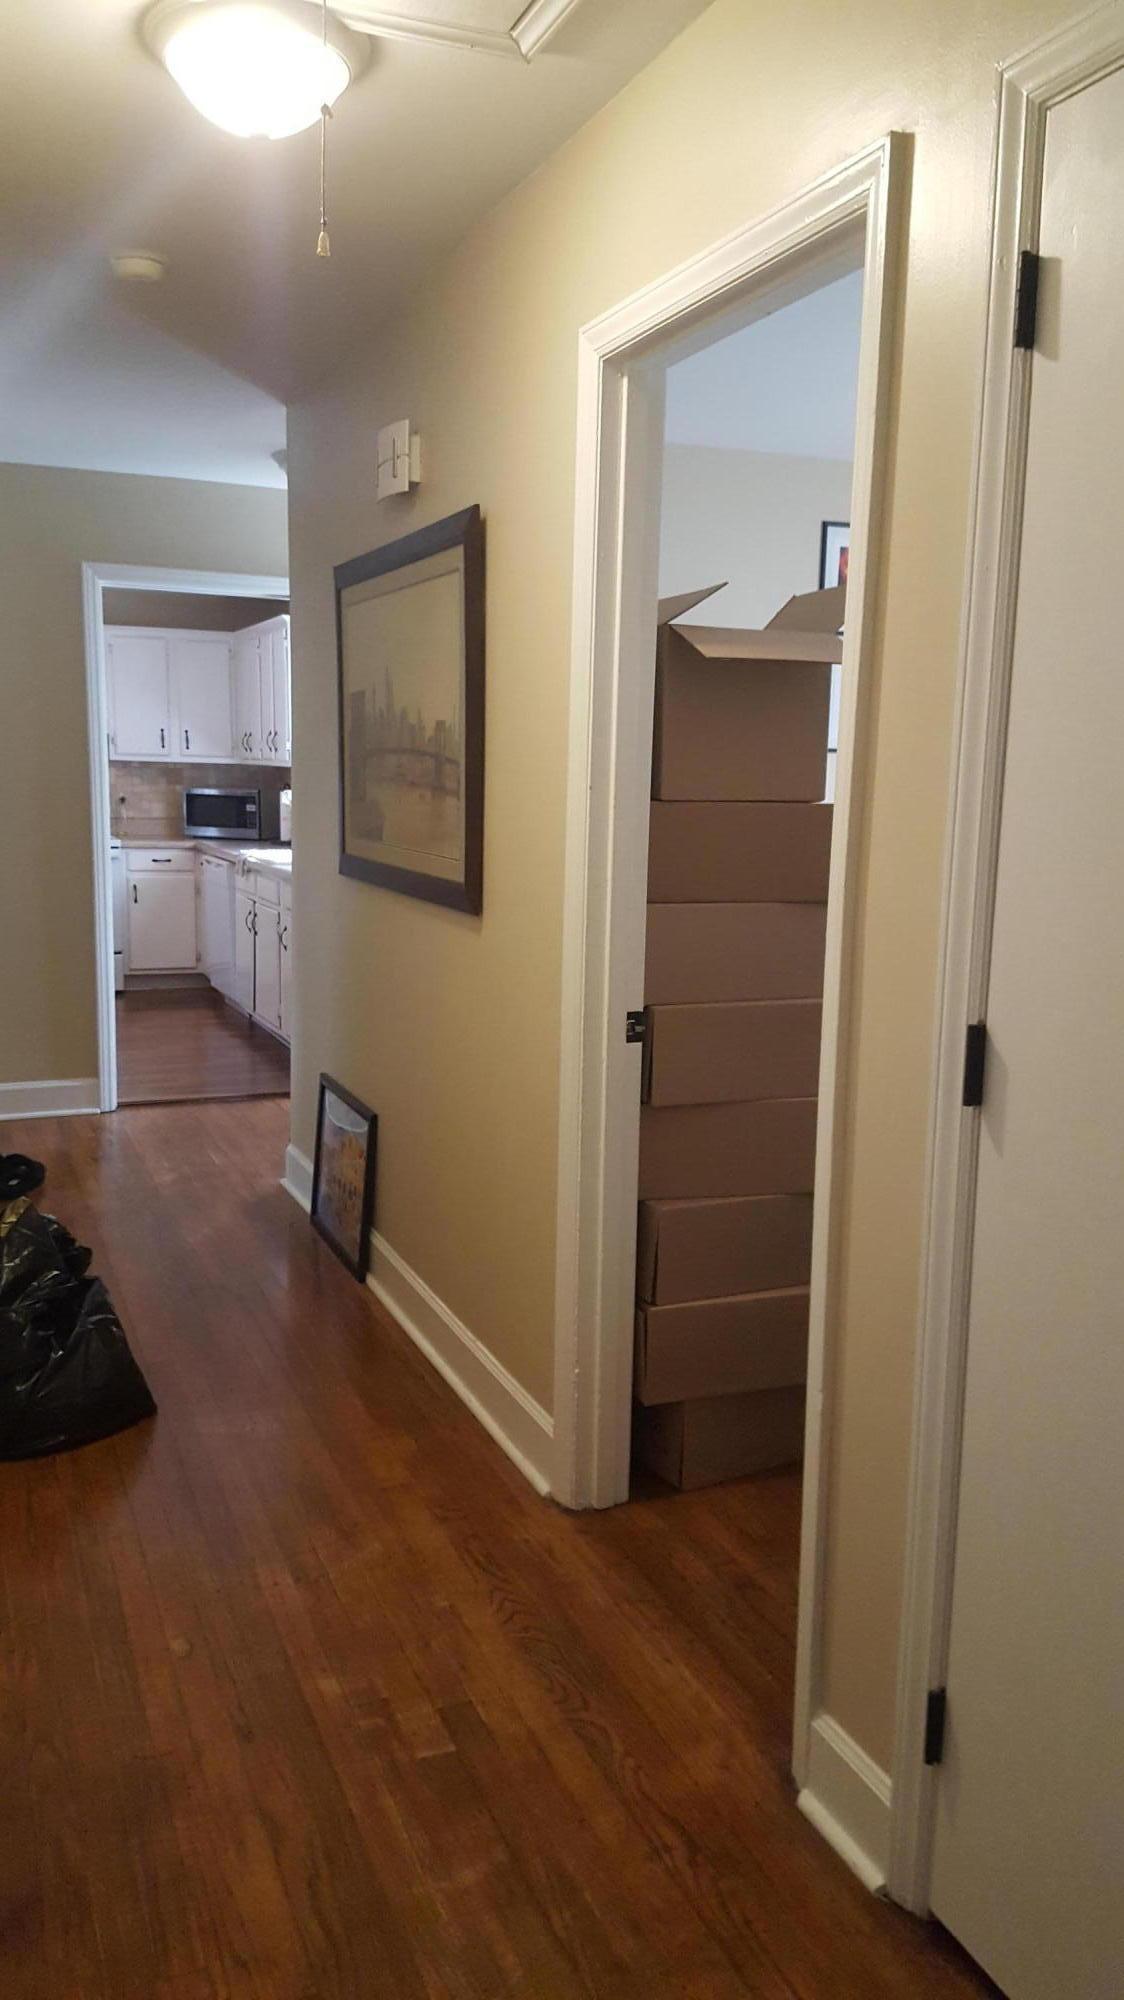 Pepperhill Homes For Sale - 7640 Hillandale, North Charleston, SC - 18